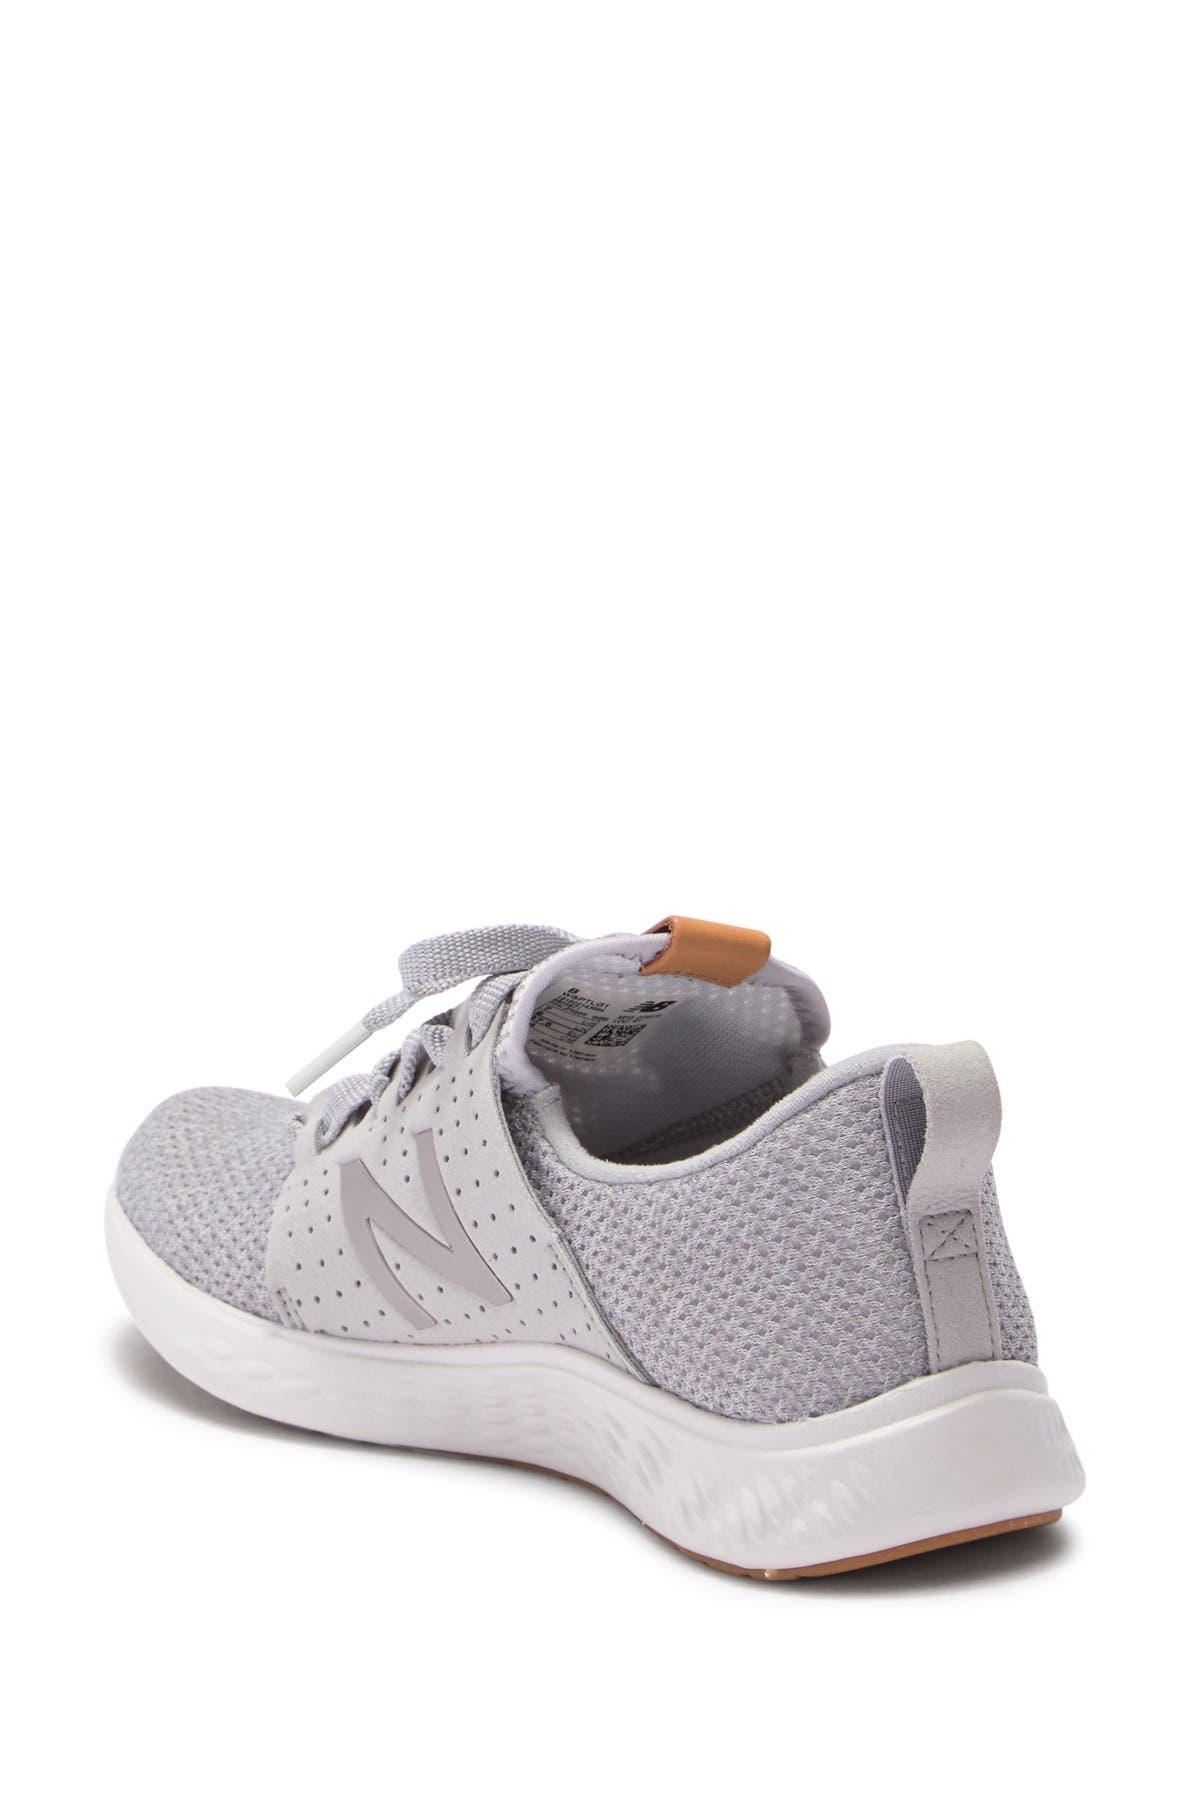 New Balance | Fresh Foam Running Shoe